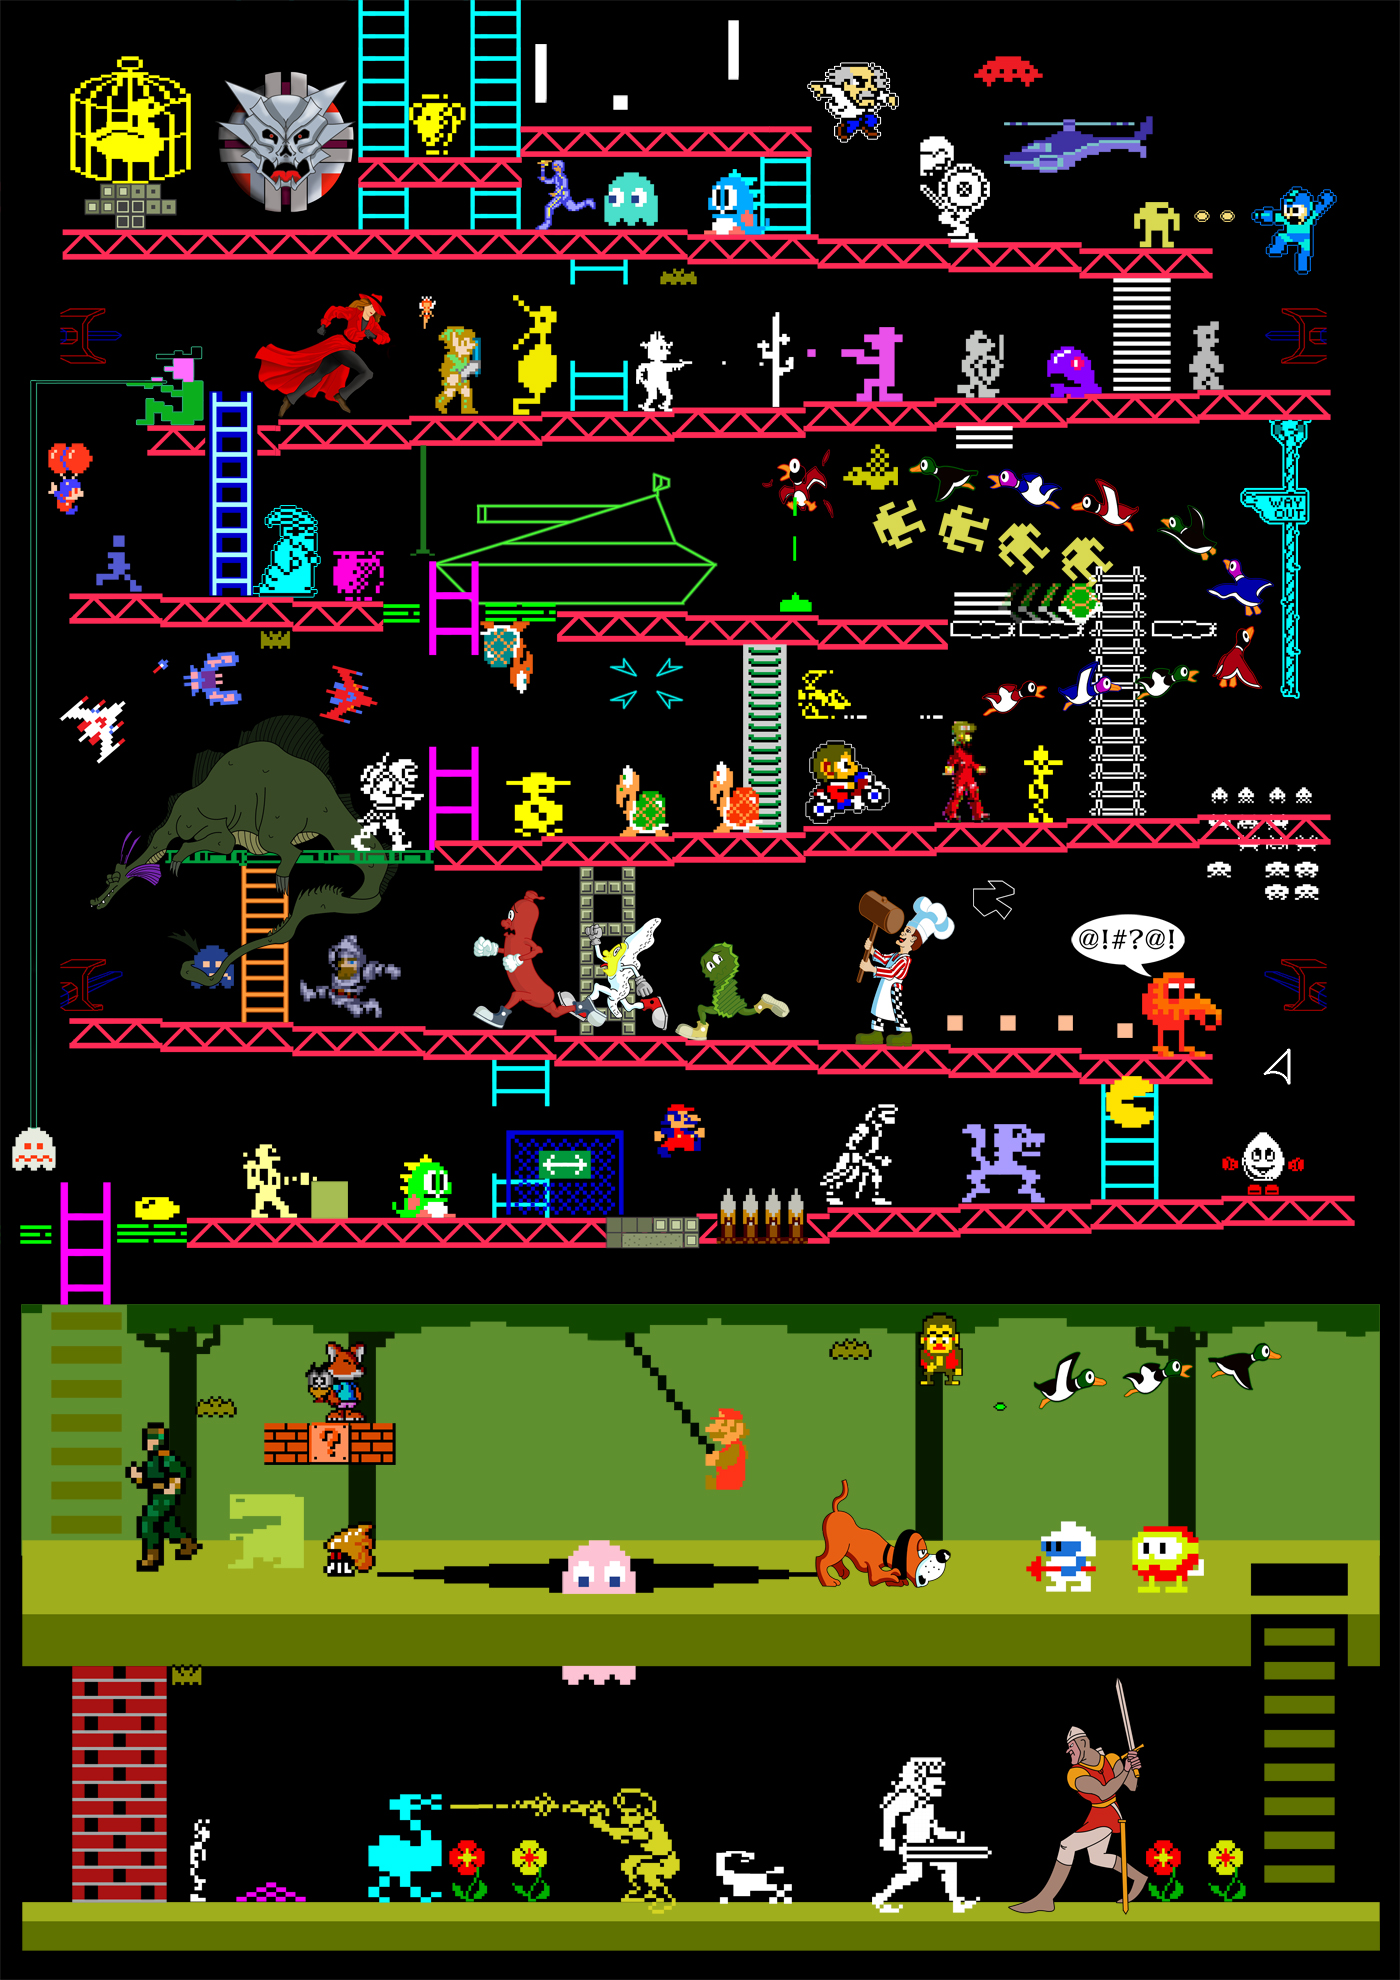 Arcade Games Mashup